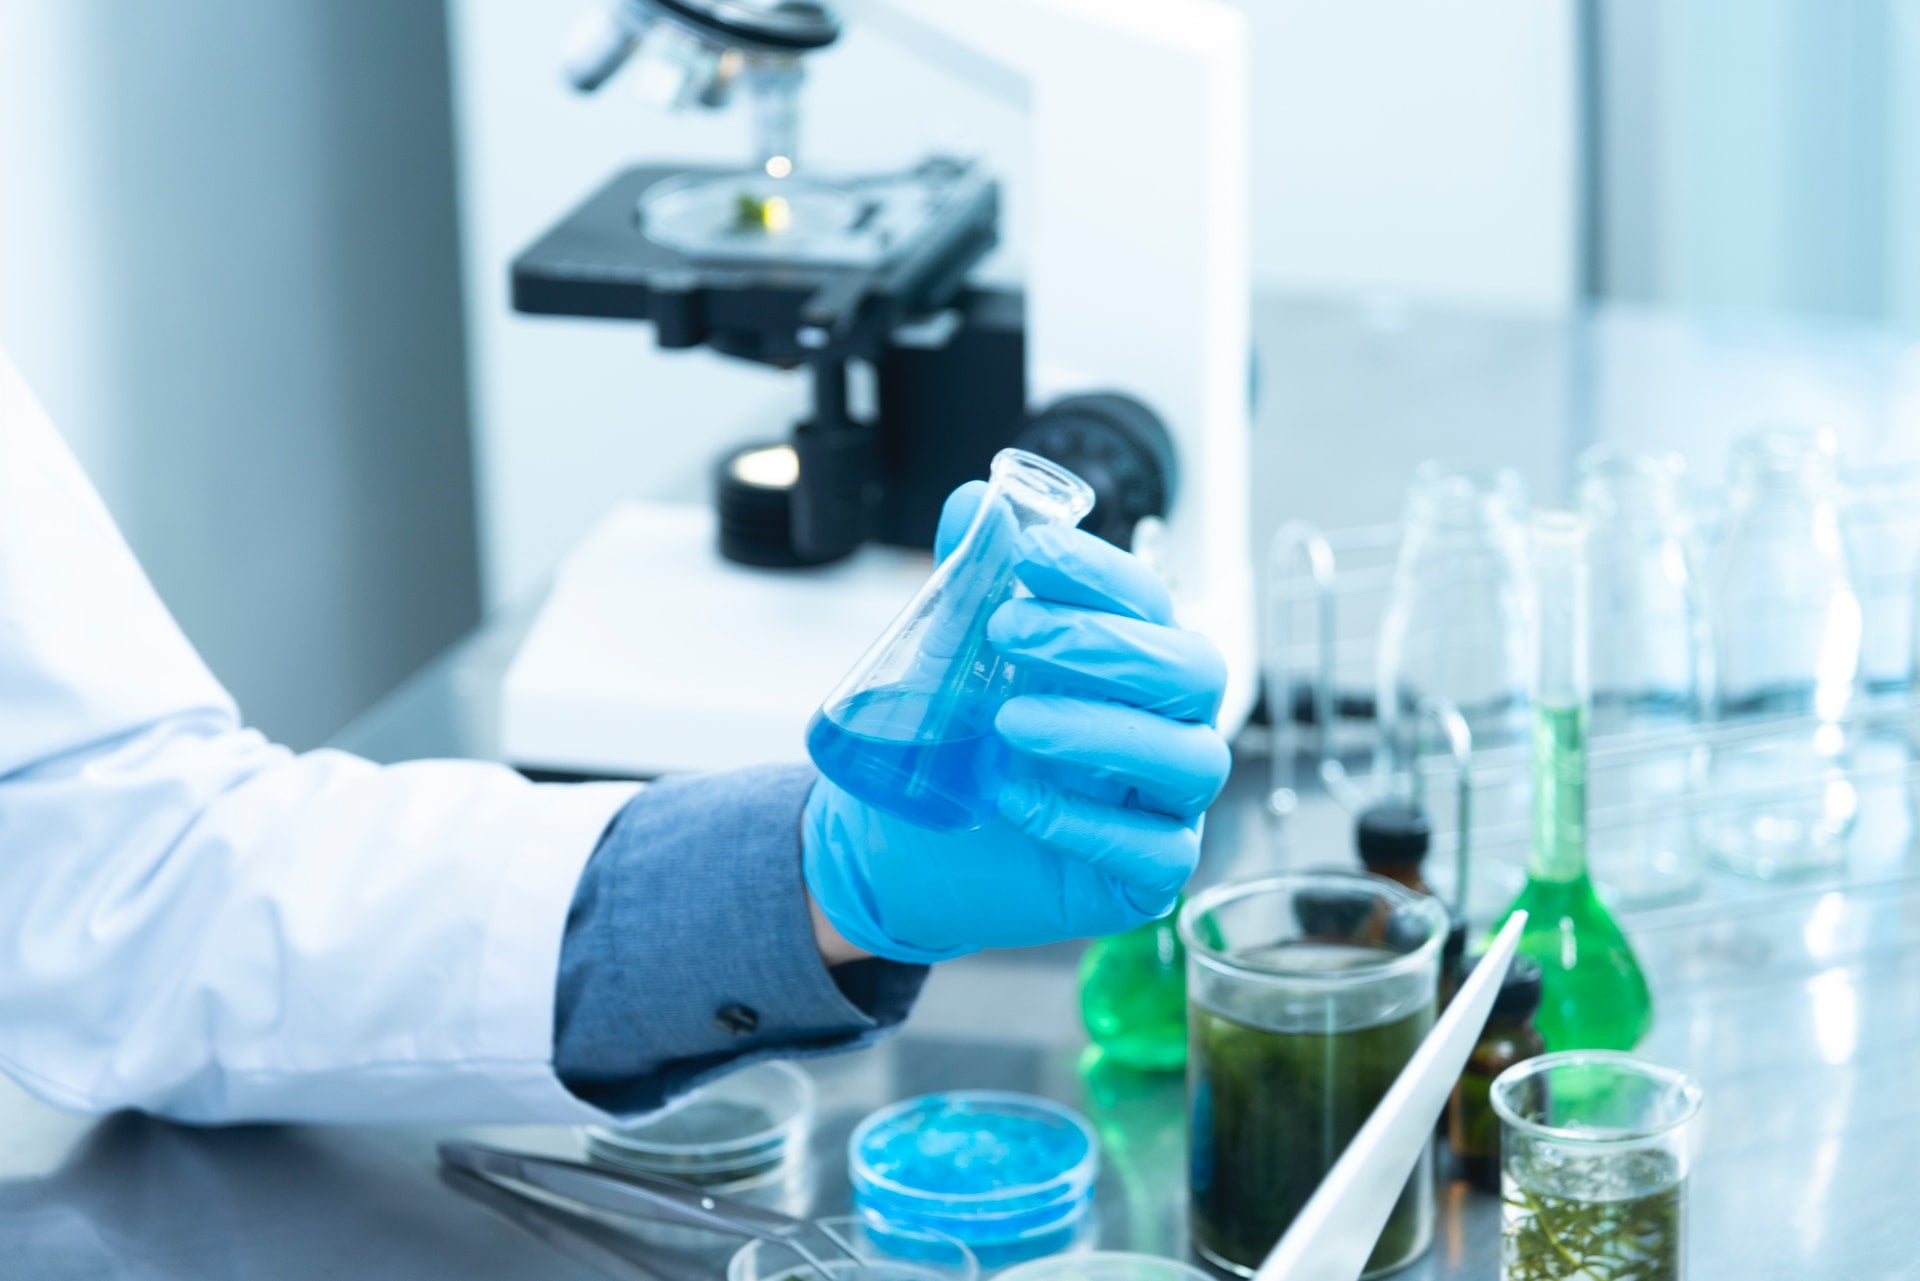 biochemistry biology microscope researcher holding Beaker Sterilization laboratory 1